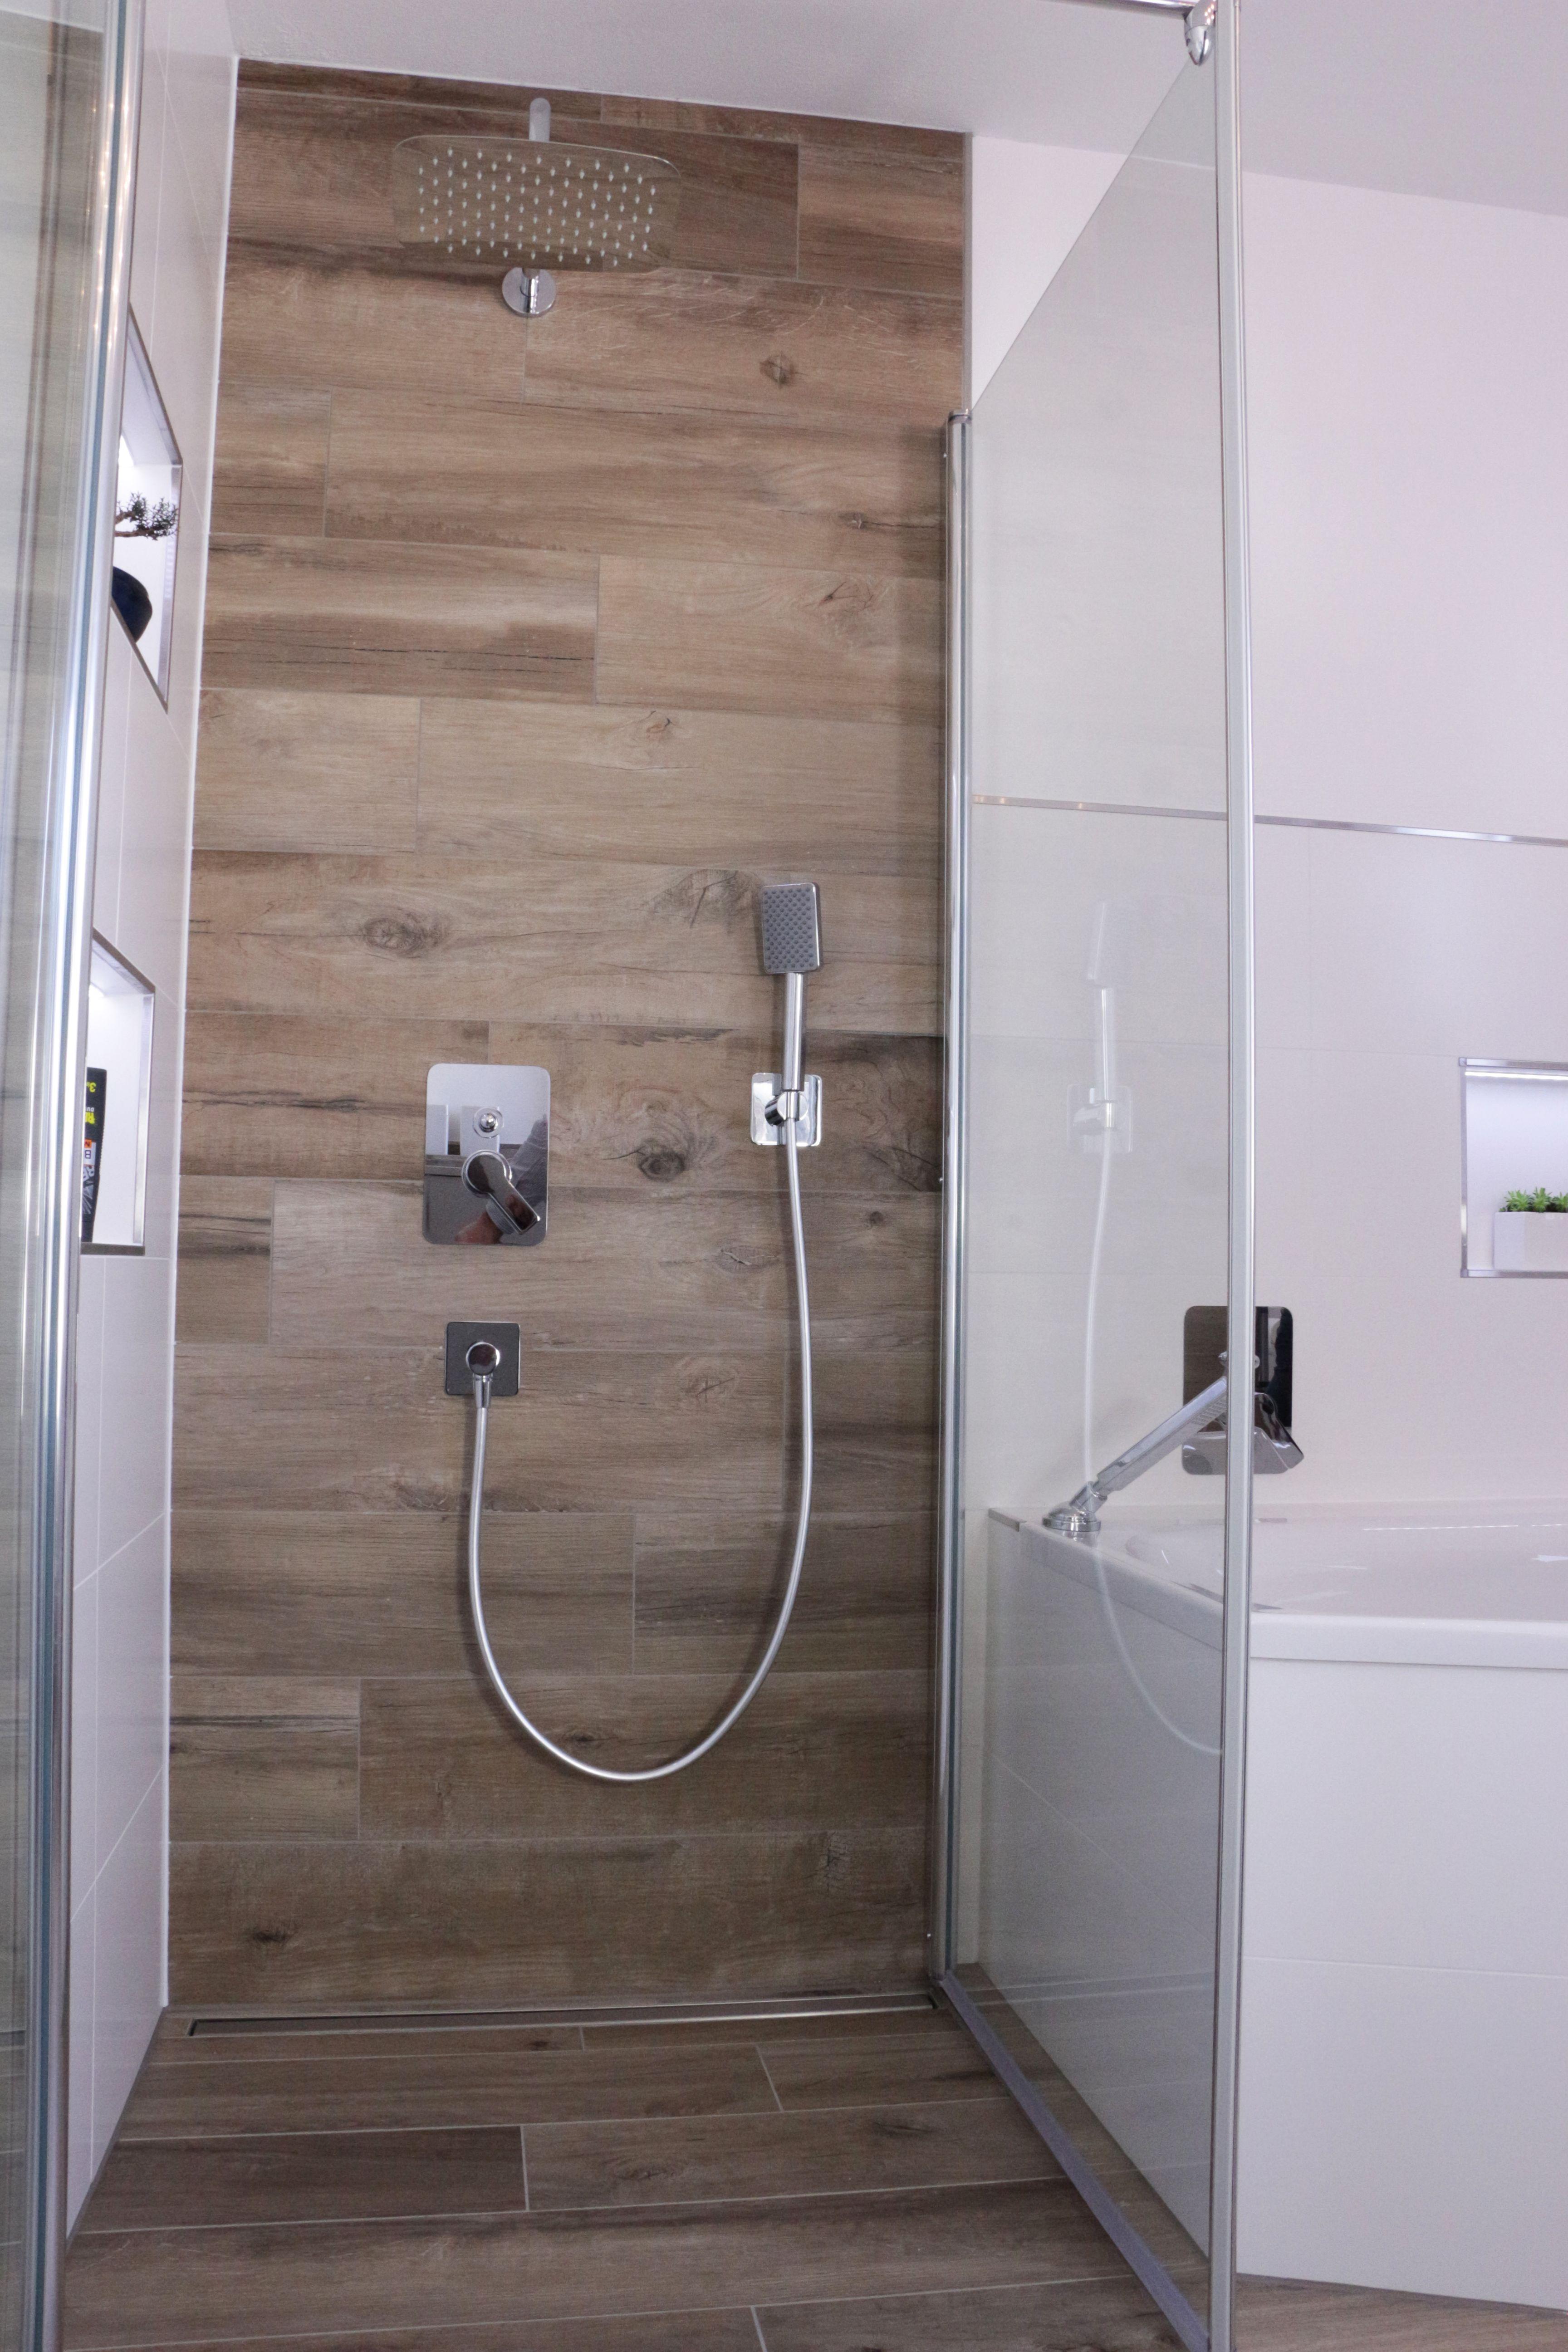 Rain Shower In The Bathroom Regendusche Im Badezimmer Tiles In